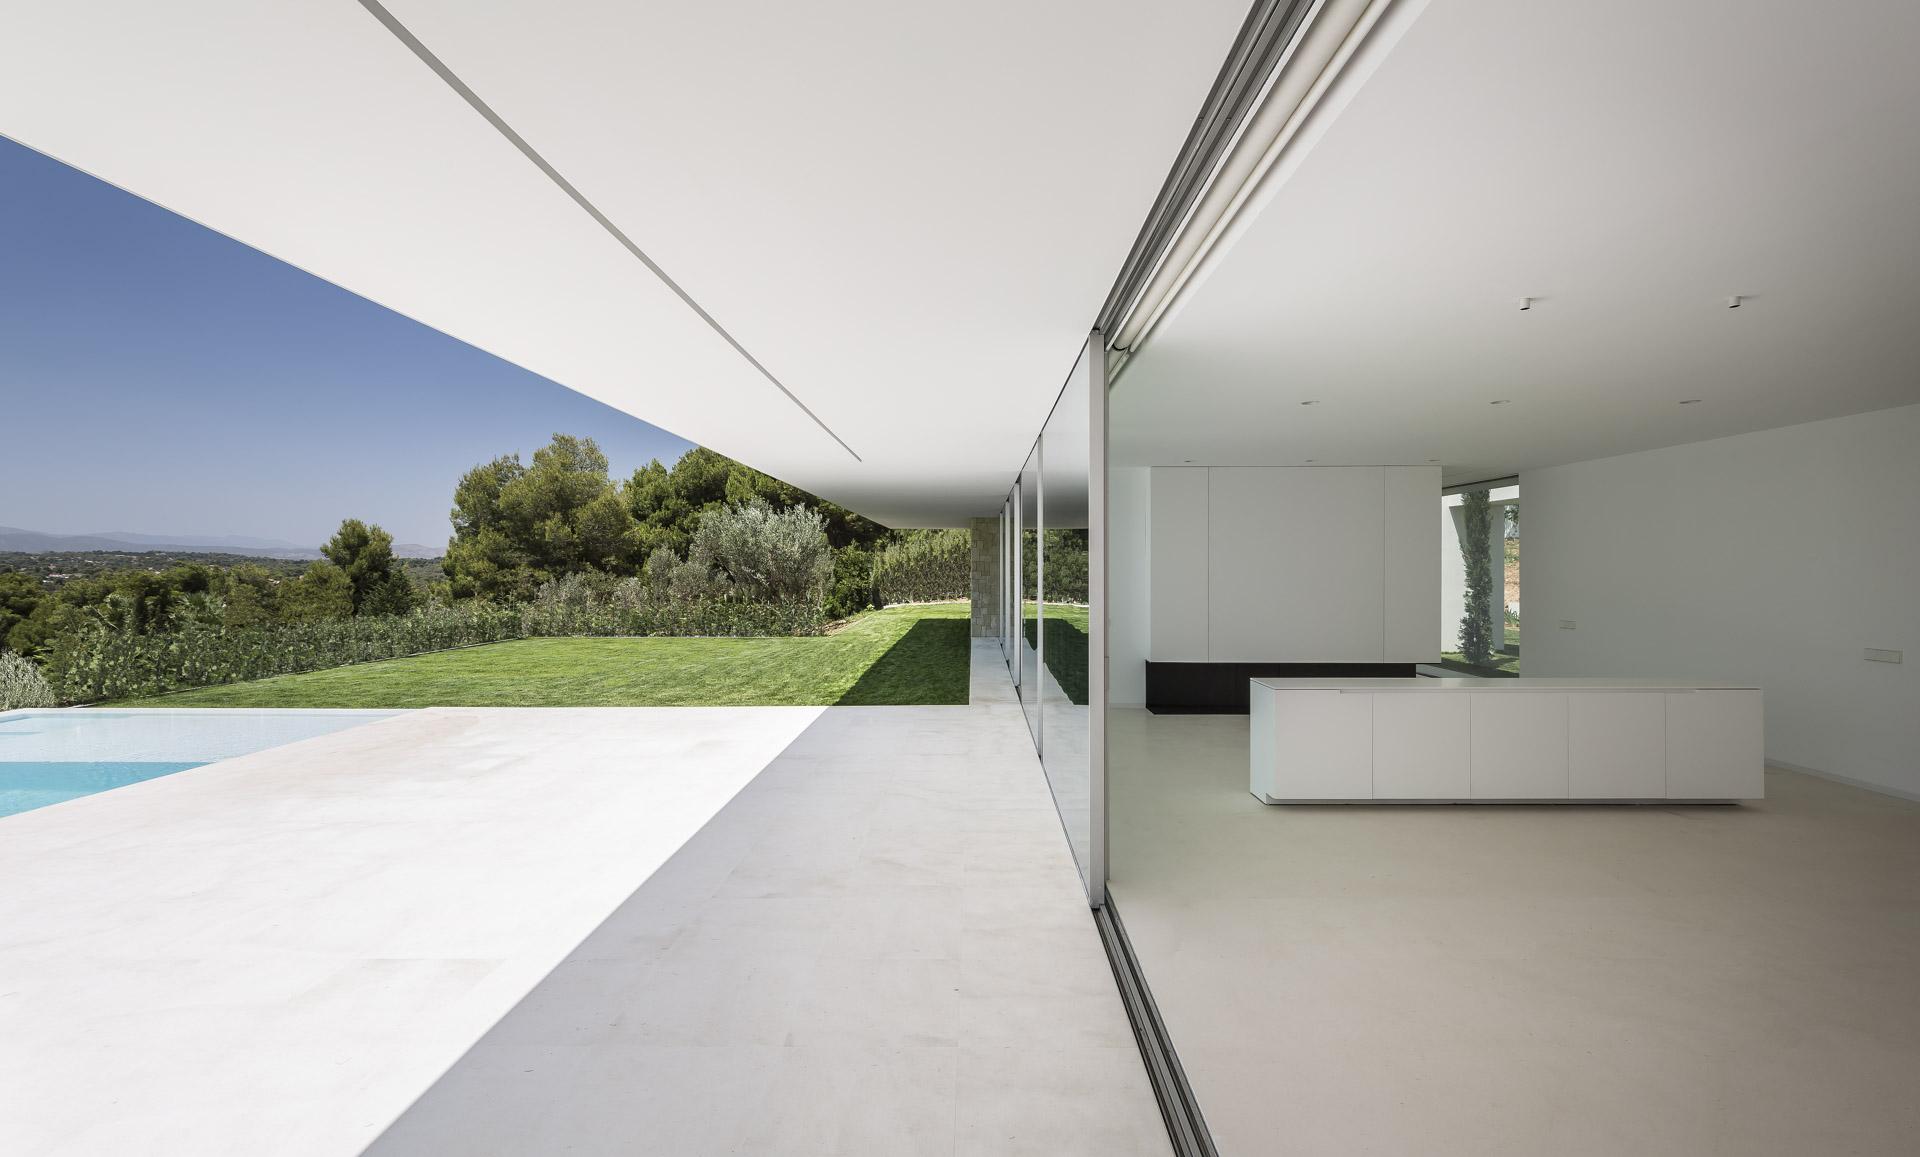 fotografia-arquitectura-valencia-german-cabo-gallardo-llopis-villamarchante-vivienda-20